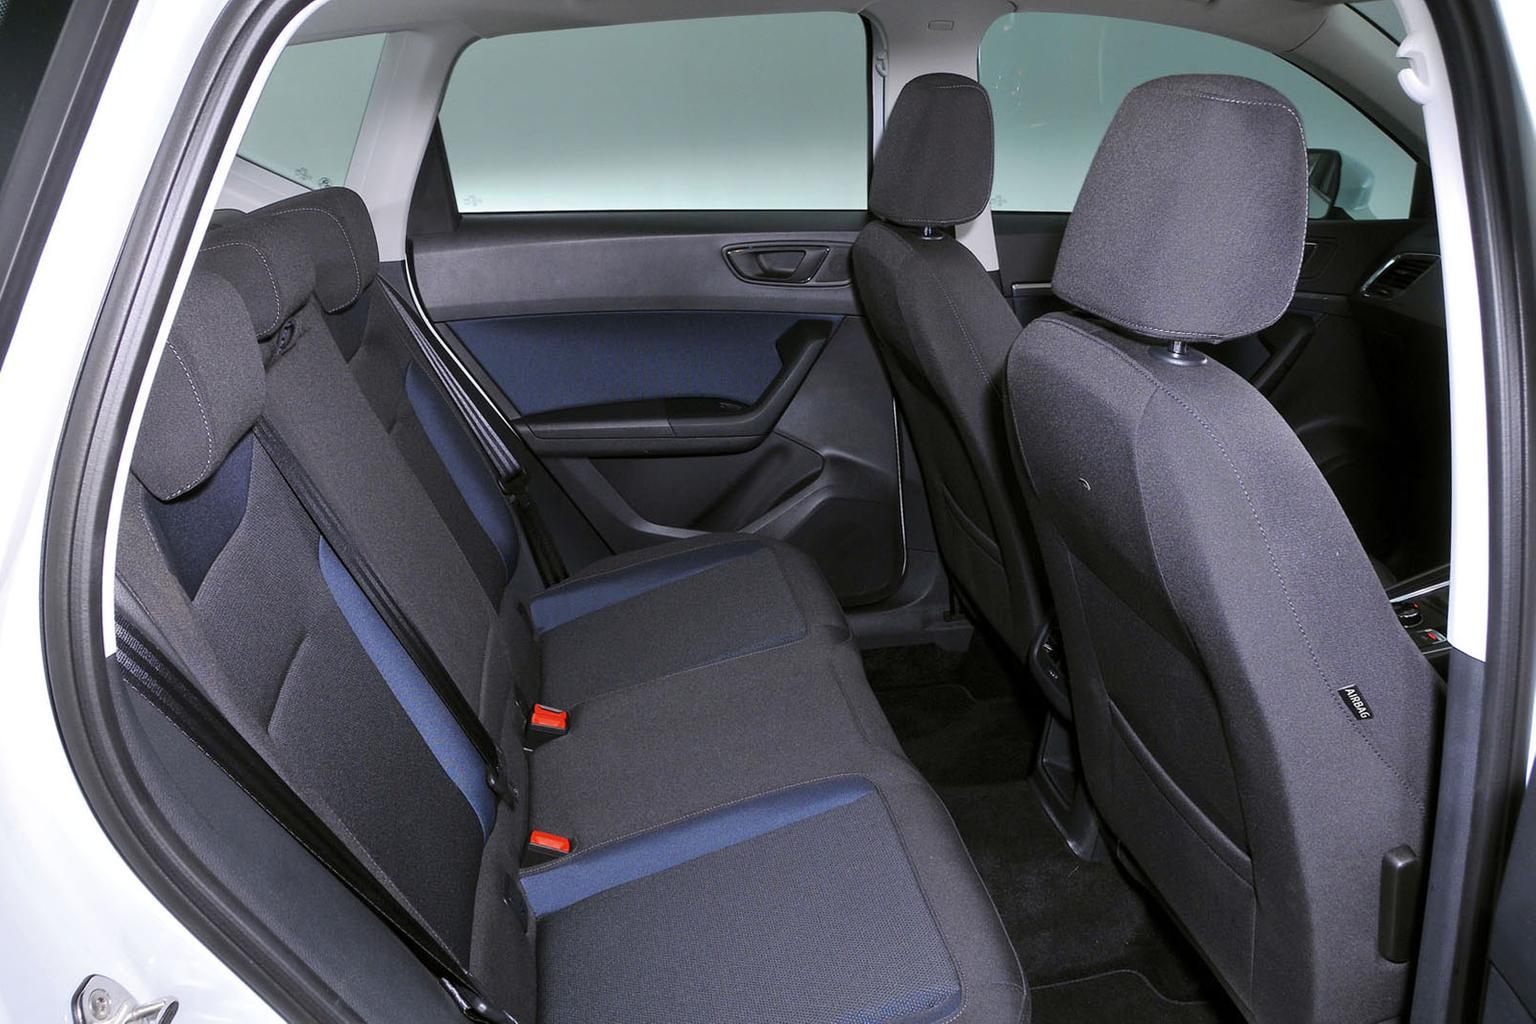 New Nissan Qashqai vs Seat Ateca